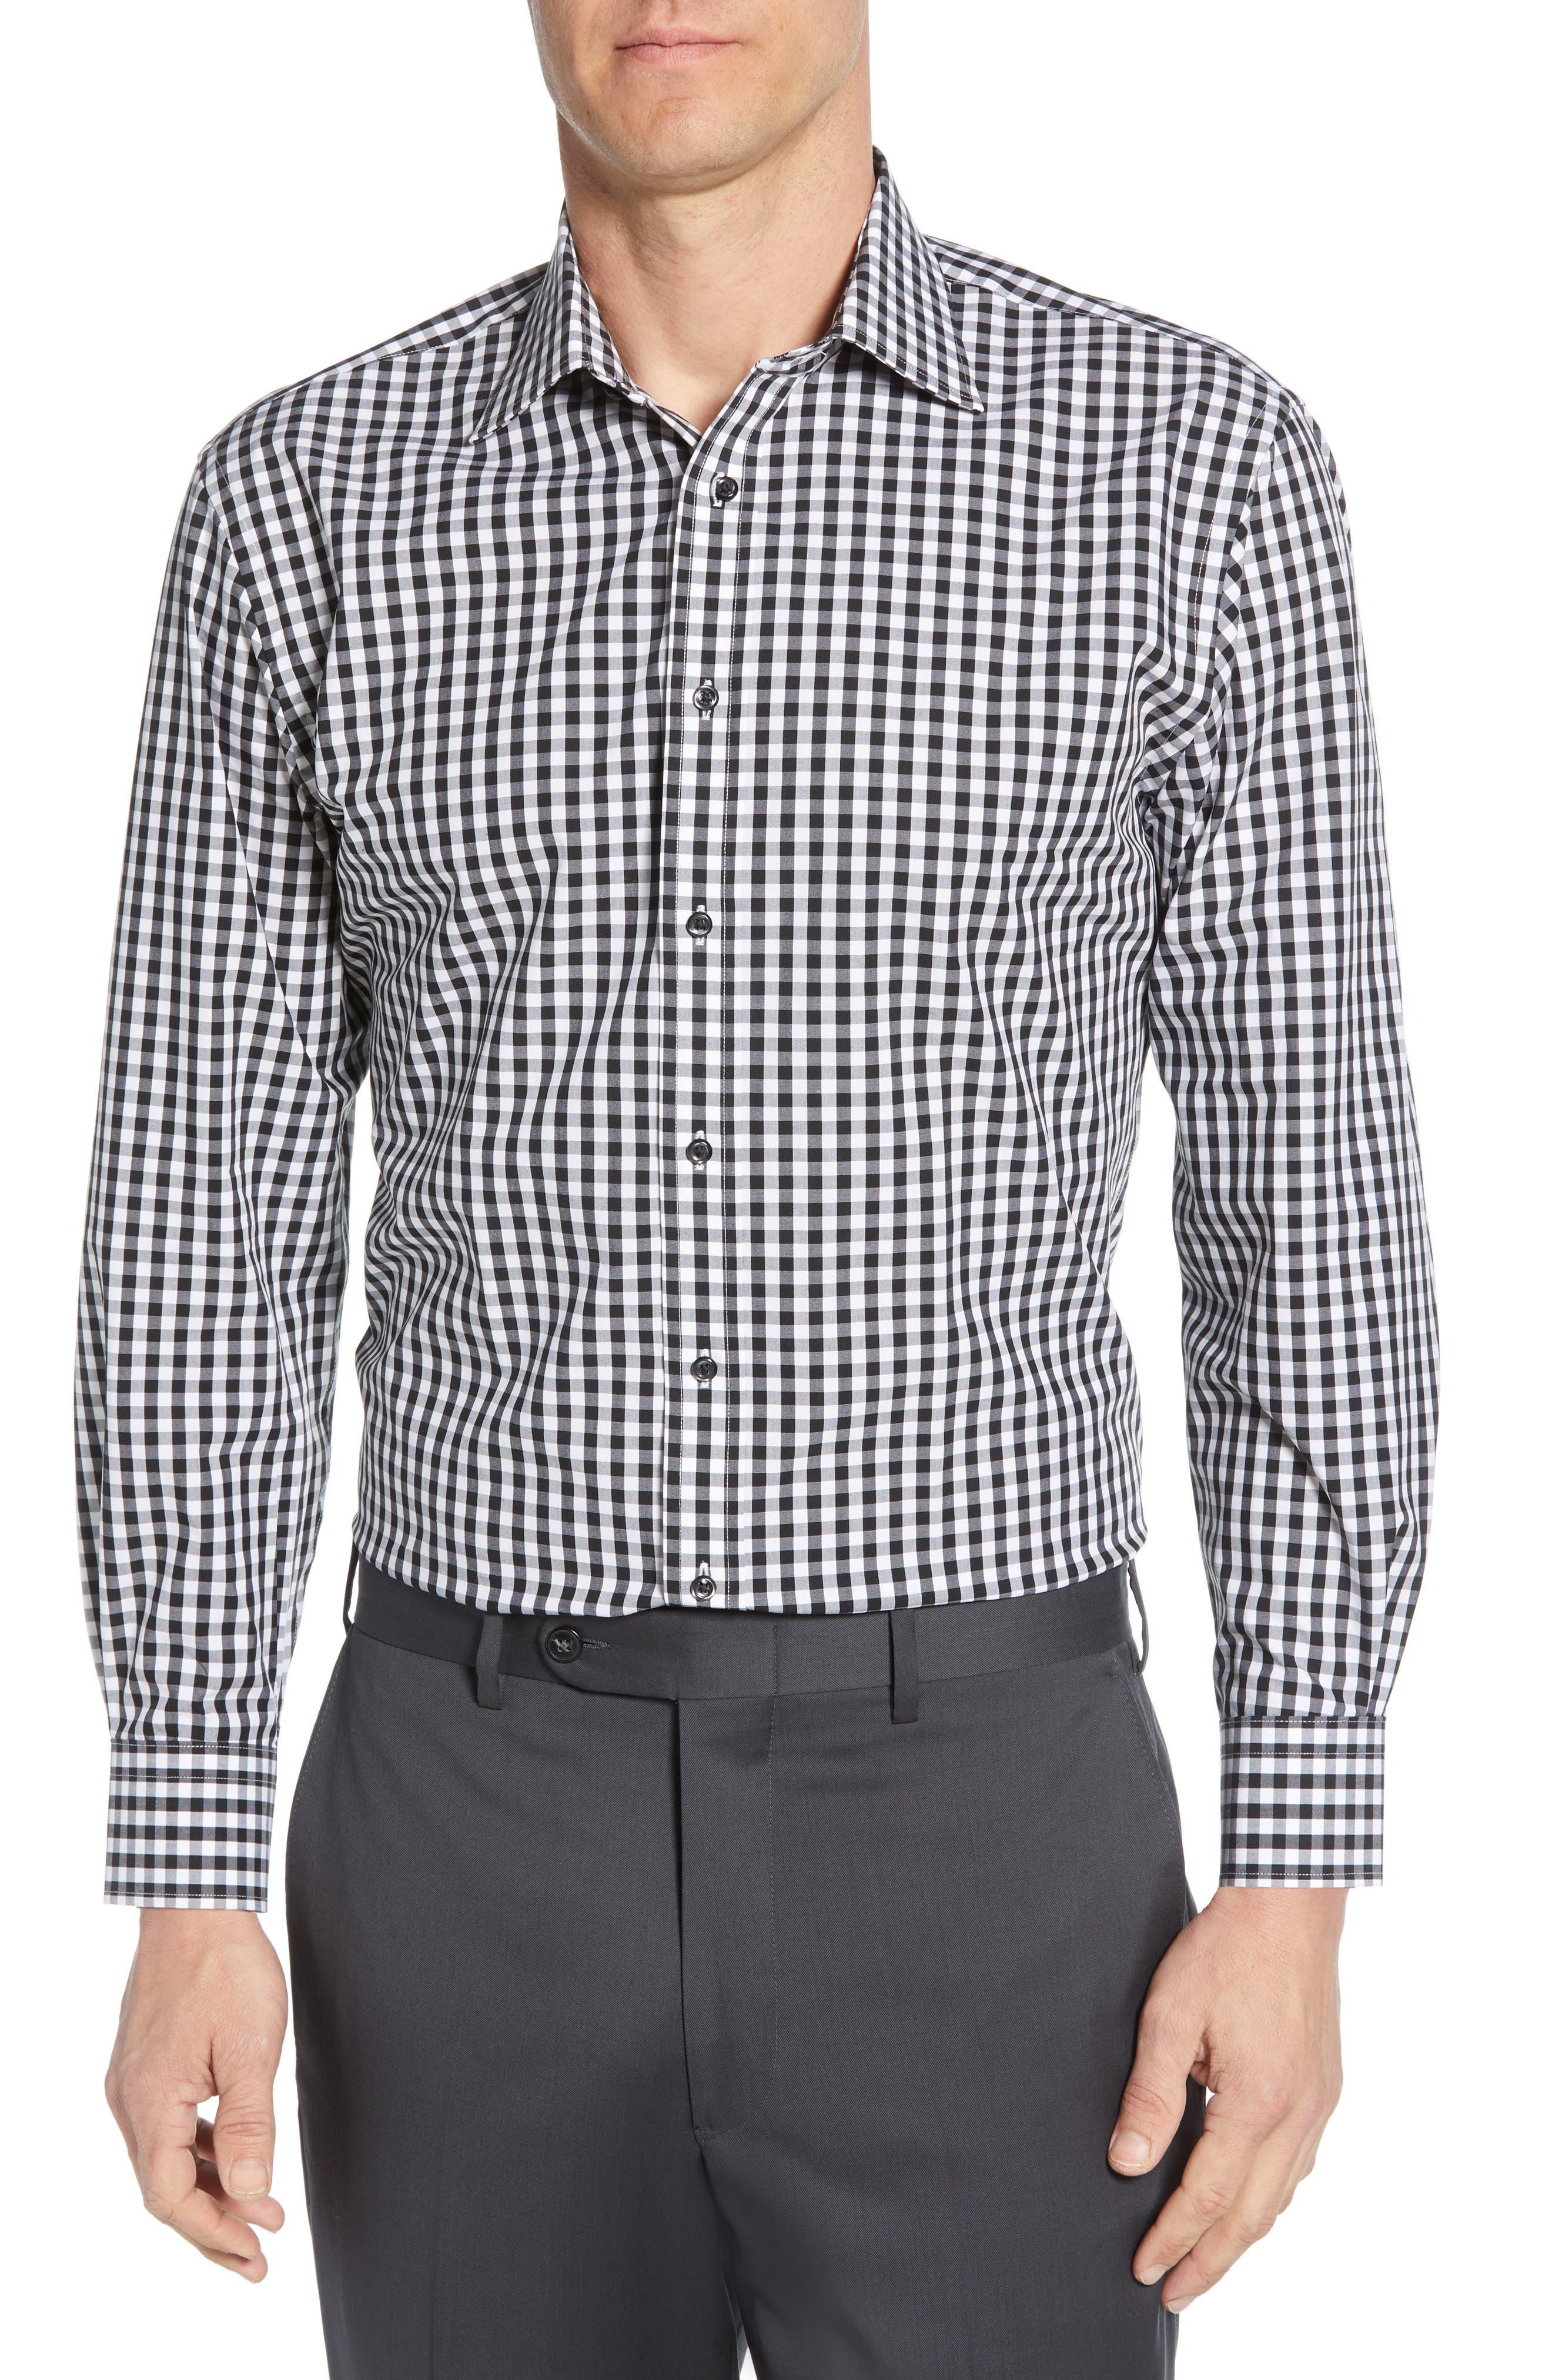 NORDSTROM MEN'S SHOP Tech-Smart Traditional Fit Stretch Check Dress Shirt, Main, color, BLACK ROCK